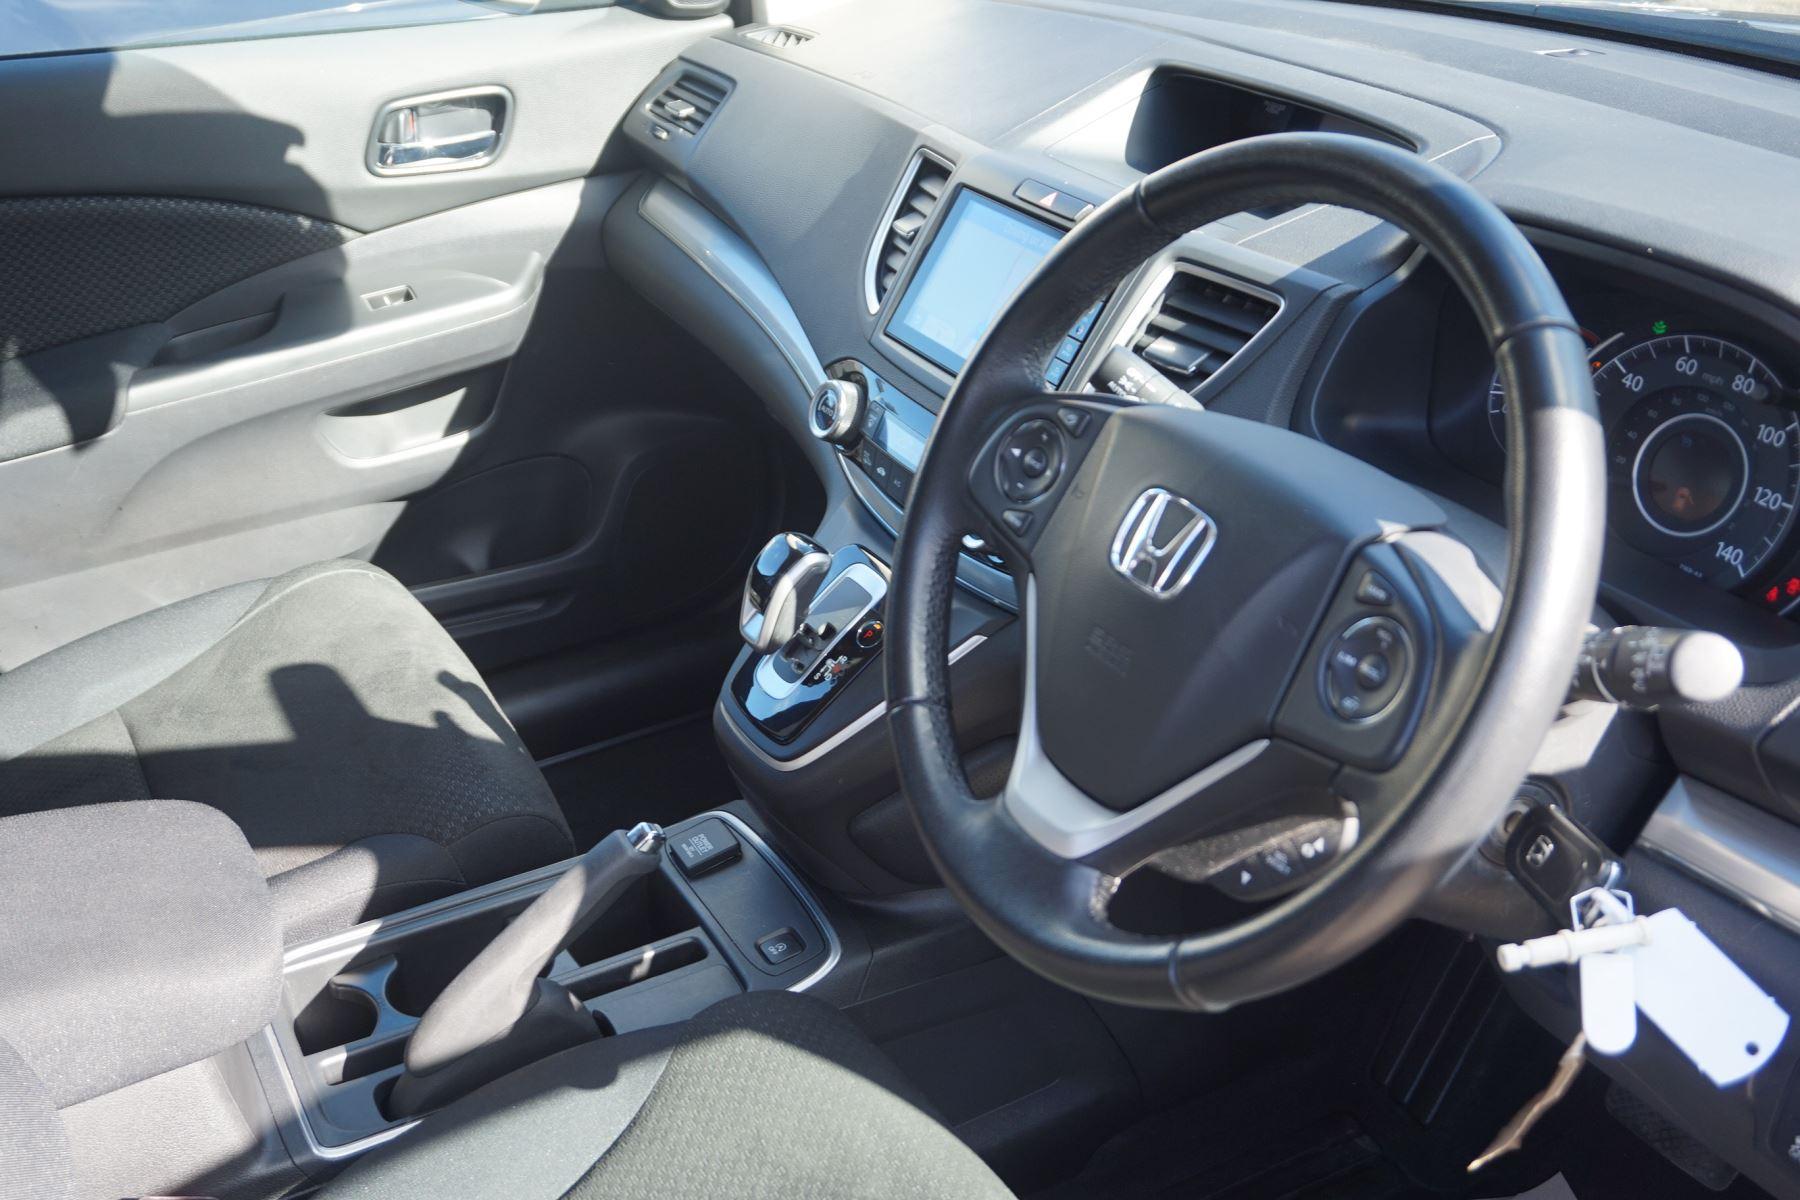 Honda CR-V 1.6 i-DTEC 160 SE Plus 5dr [Nav] 4WD image 19